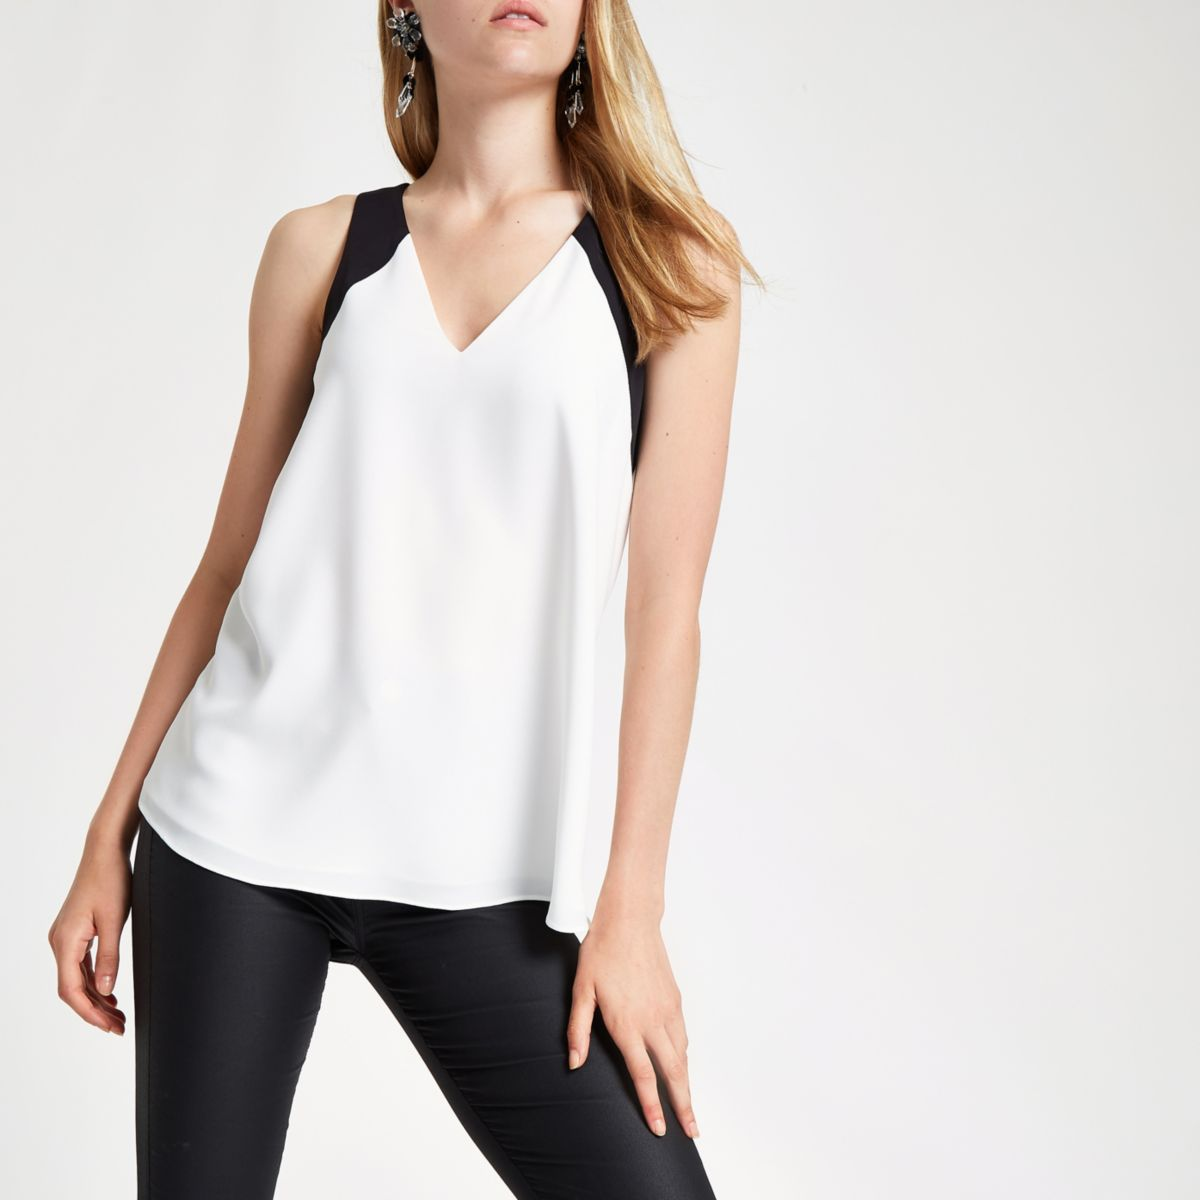 Cream V neck contrast vest top